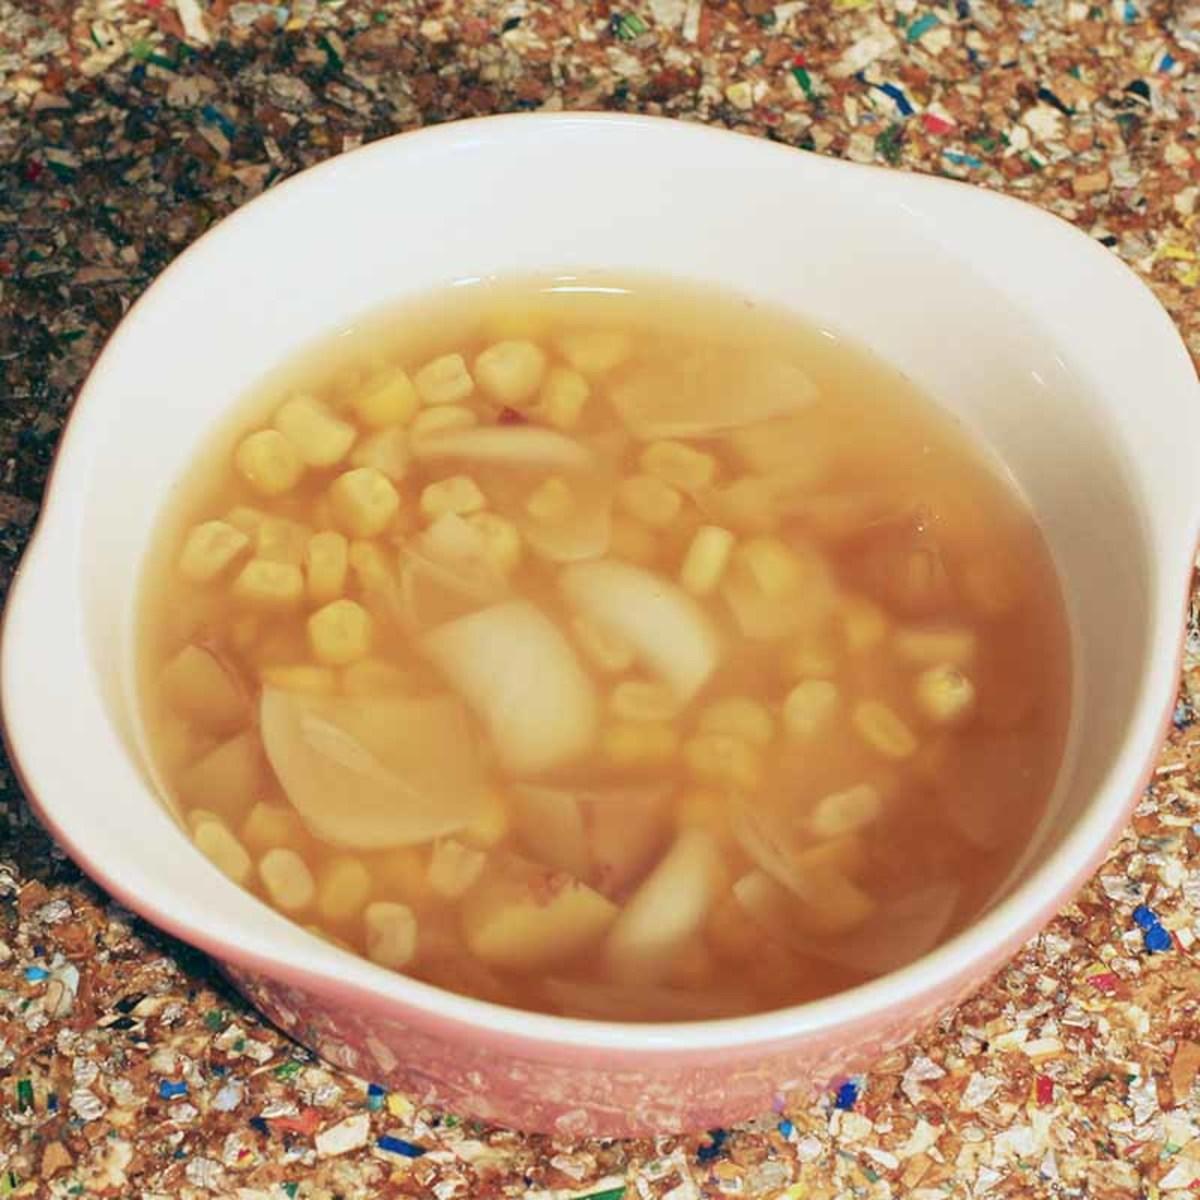 Chestnut, Lily Bulb, Corn Sweet Soup